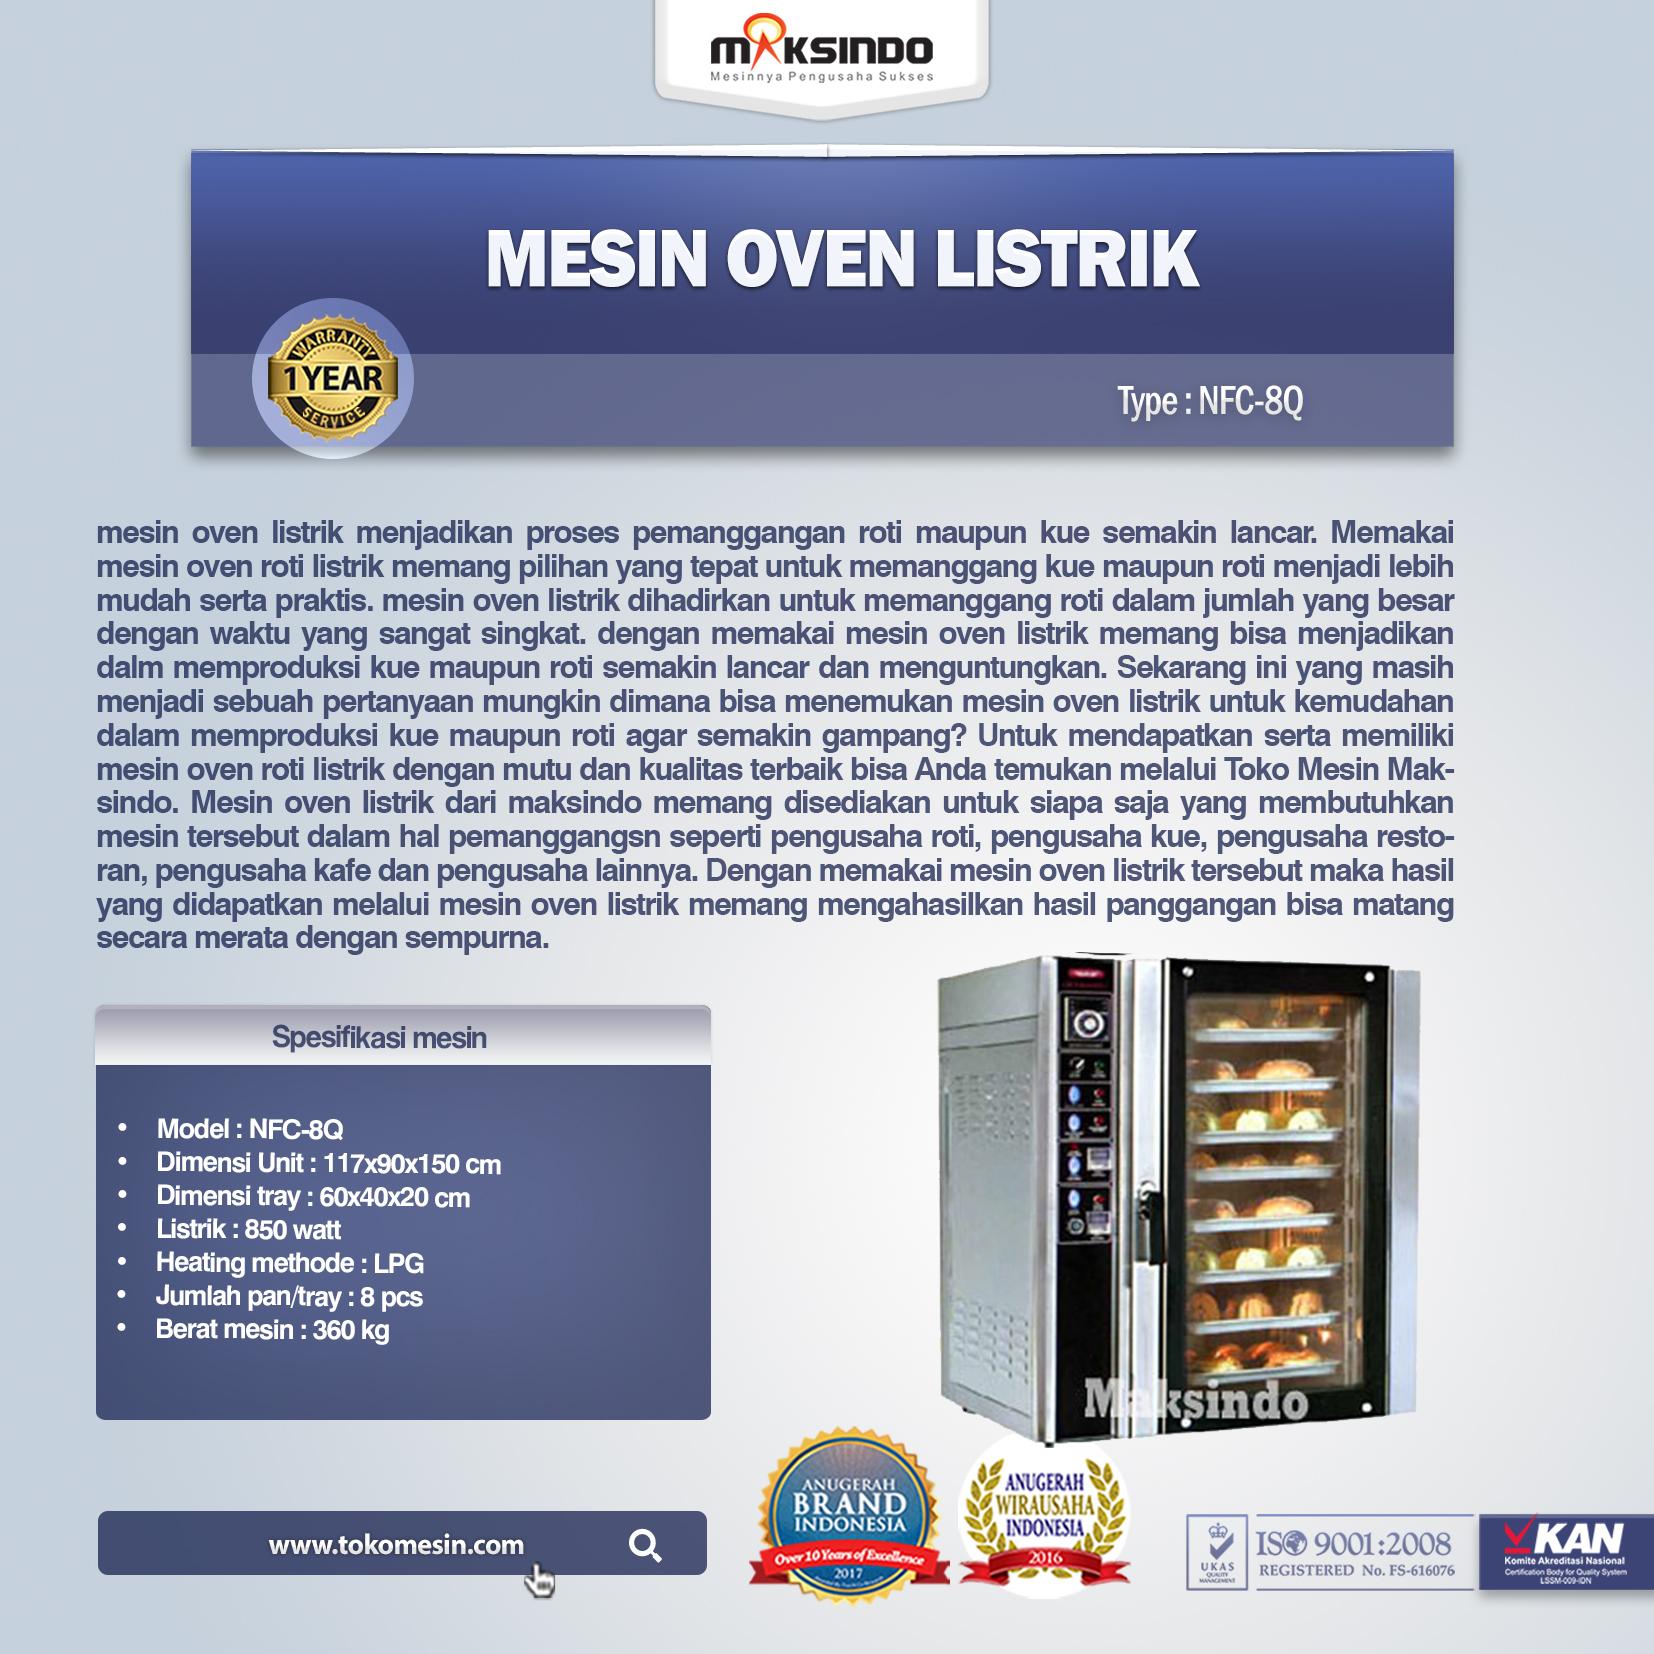 Mesin Oven Listrik NFC-8Q